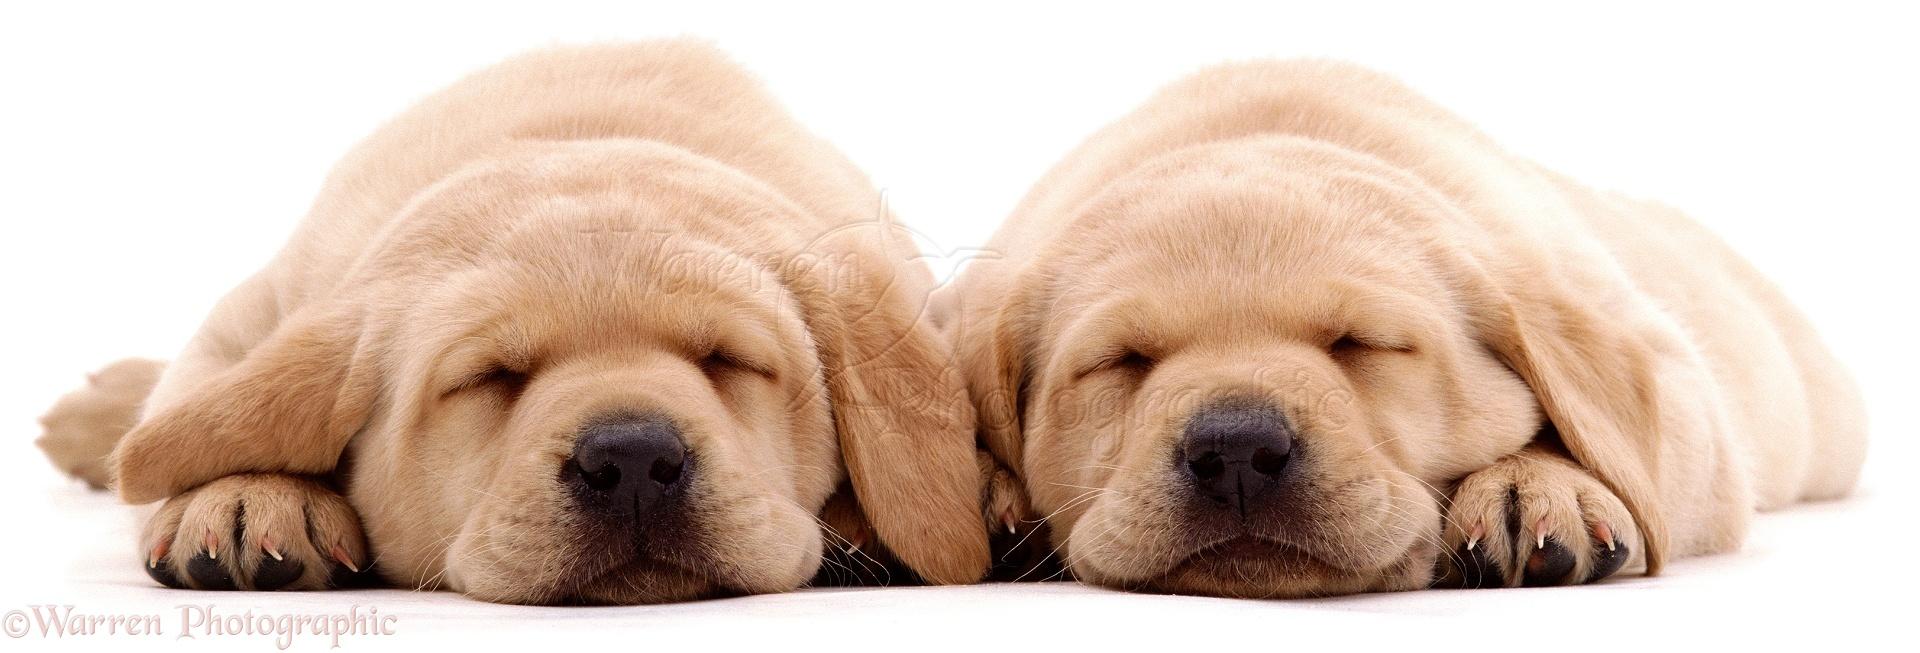 yellow lab puppy sleeping - photo #32